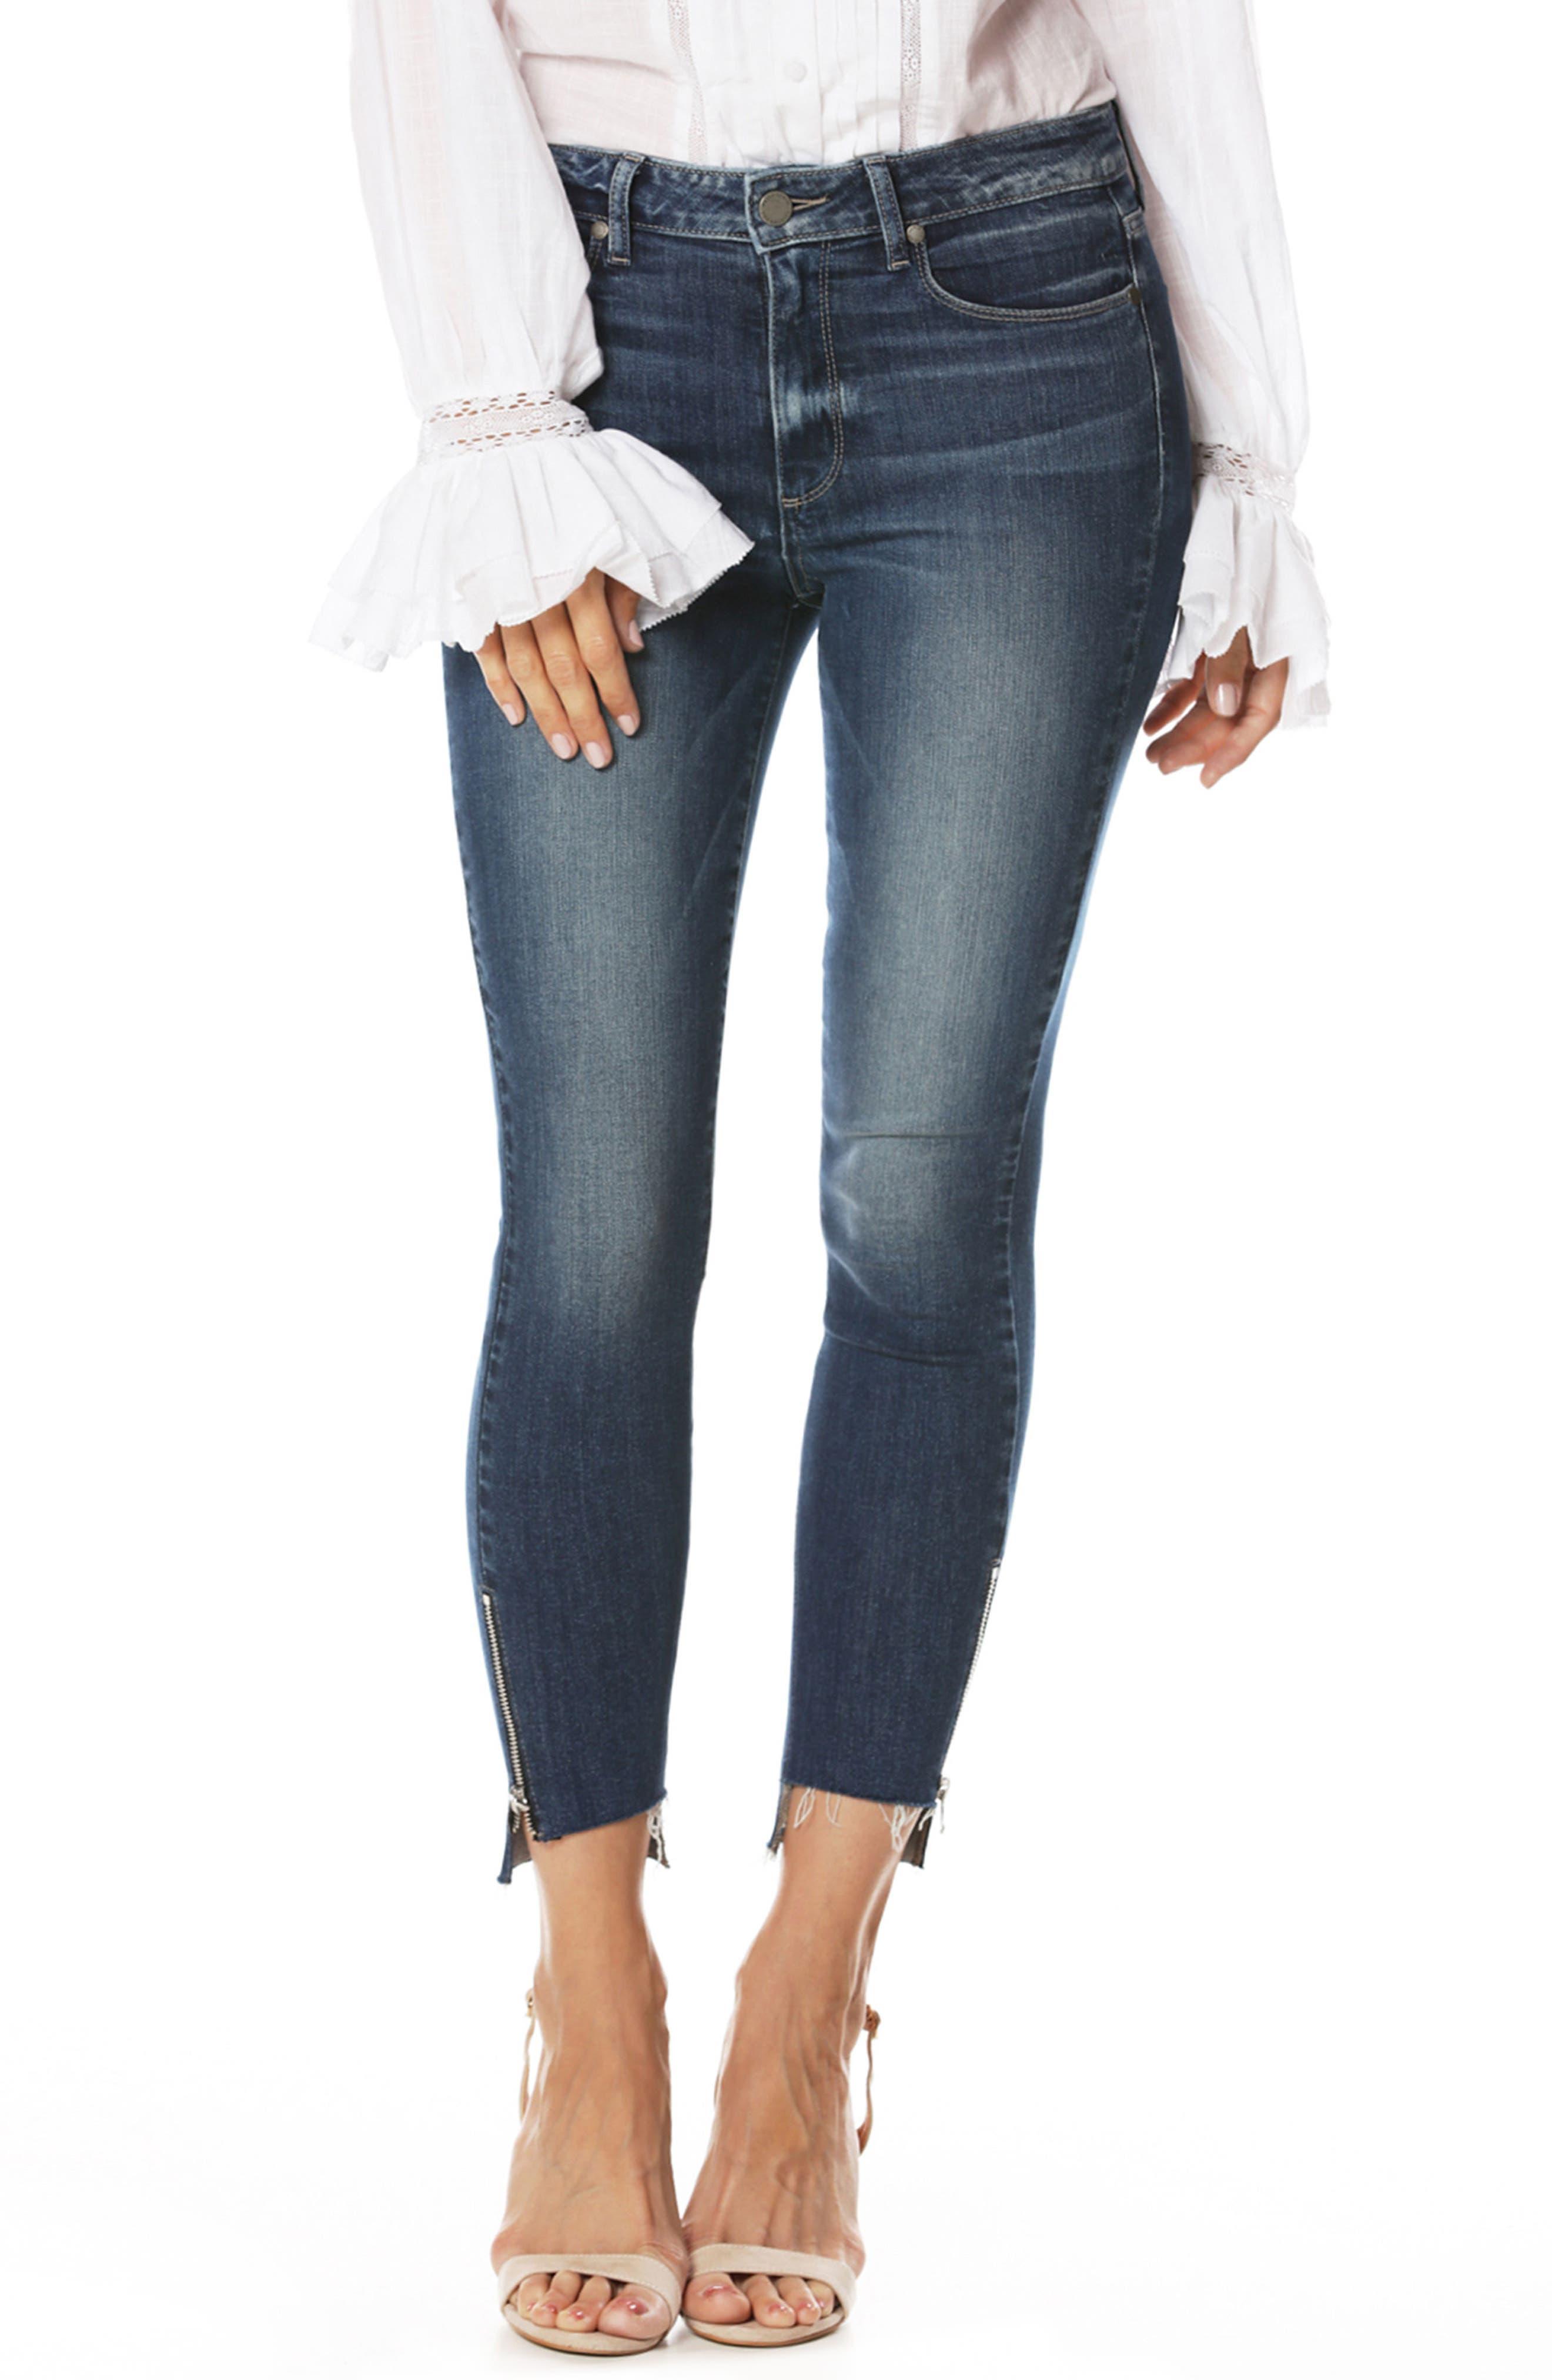 Main Image - PAIGE Transcend Vintage - Hoxton High Waist Ankle Straight Leg Jeans (Malibu)